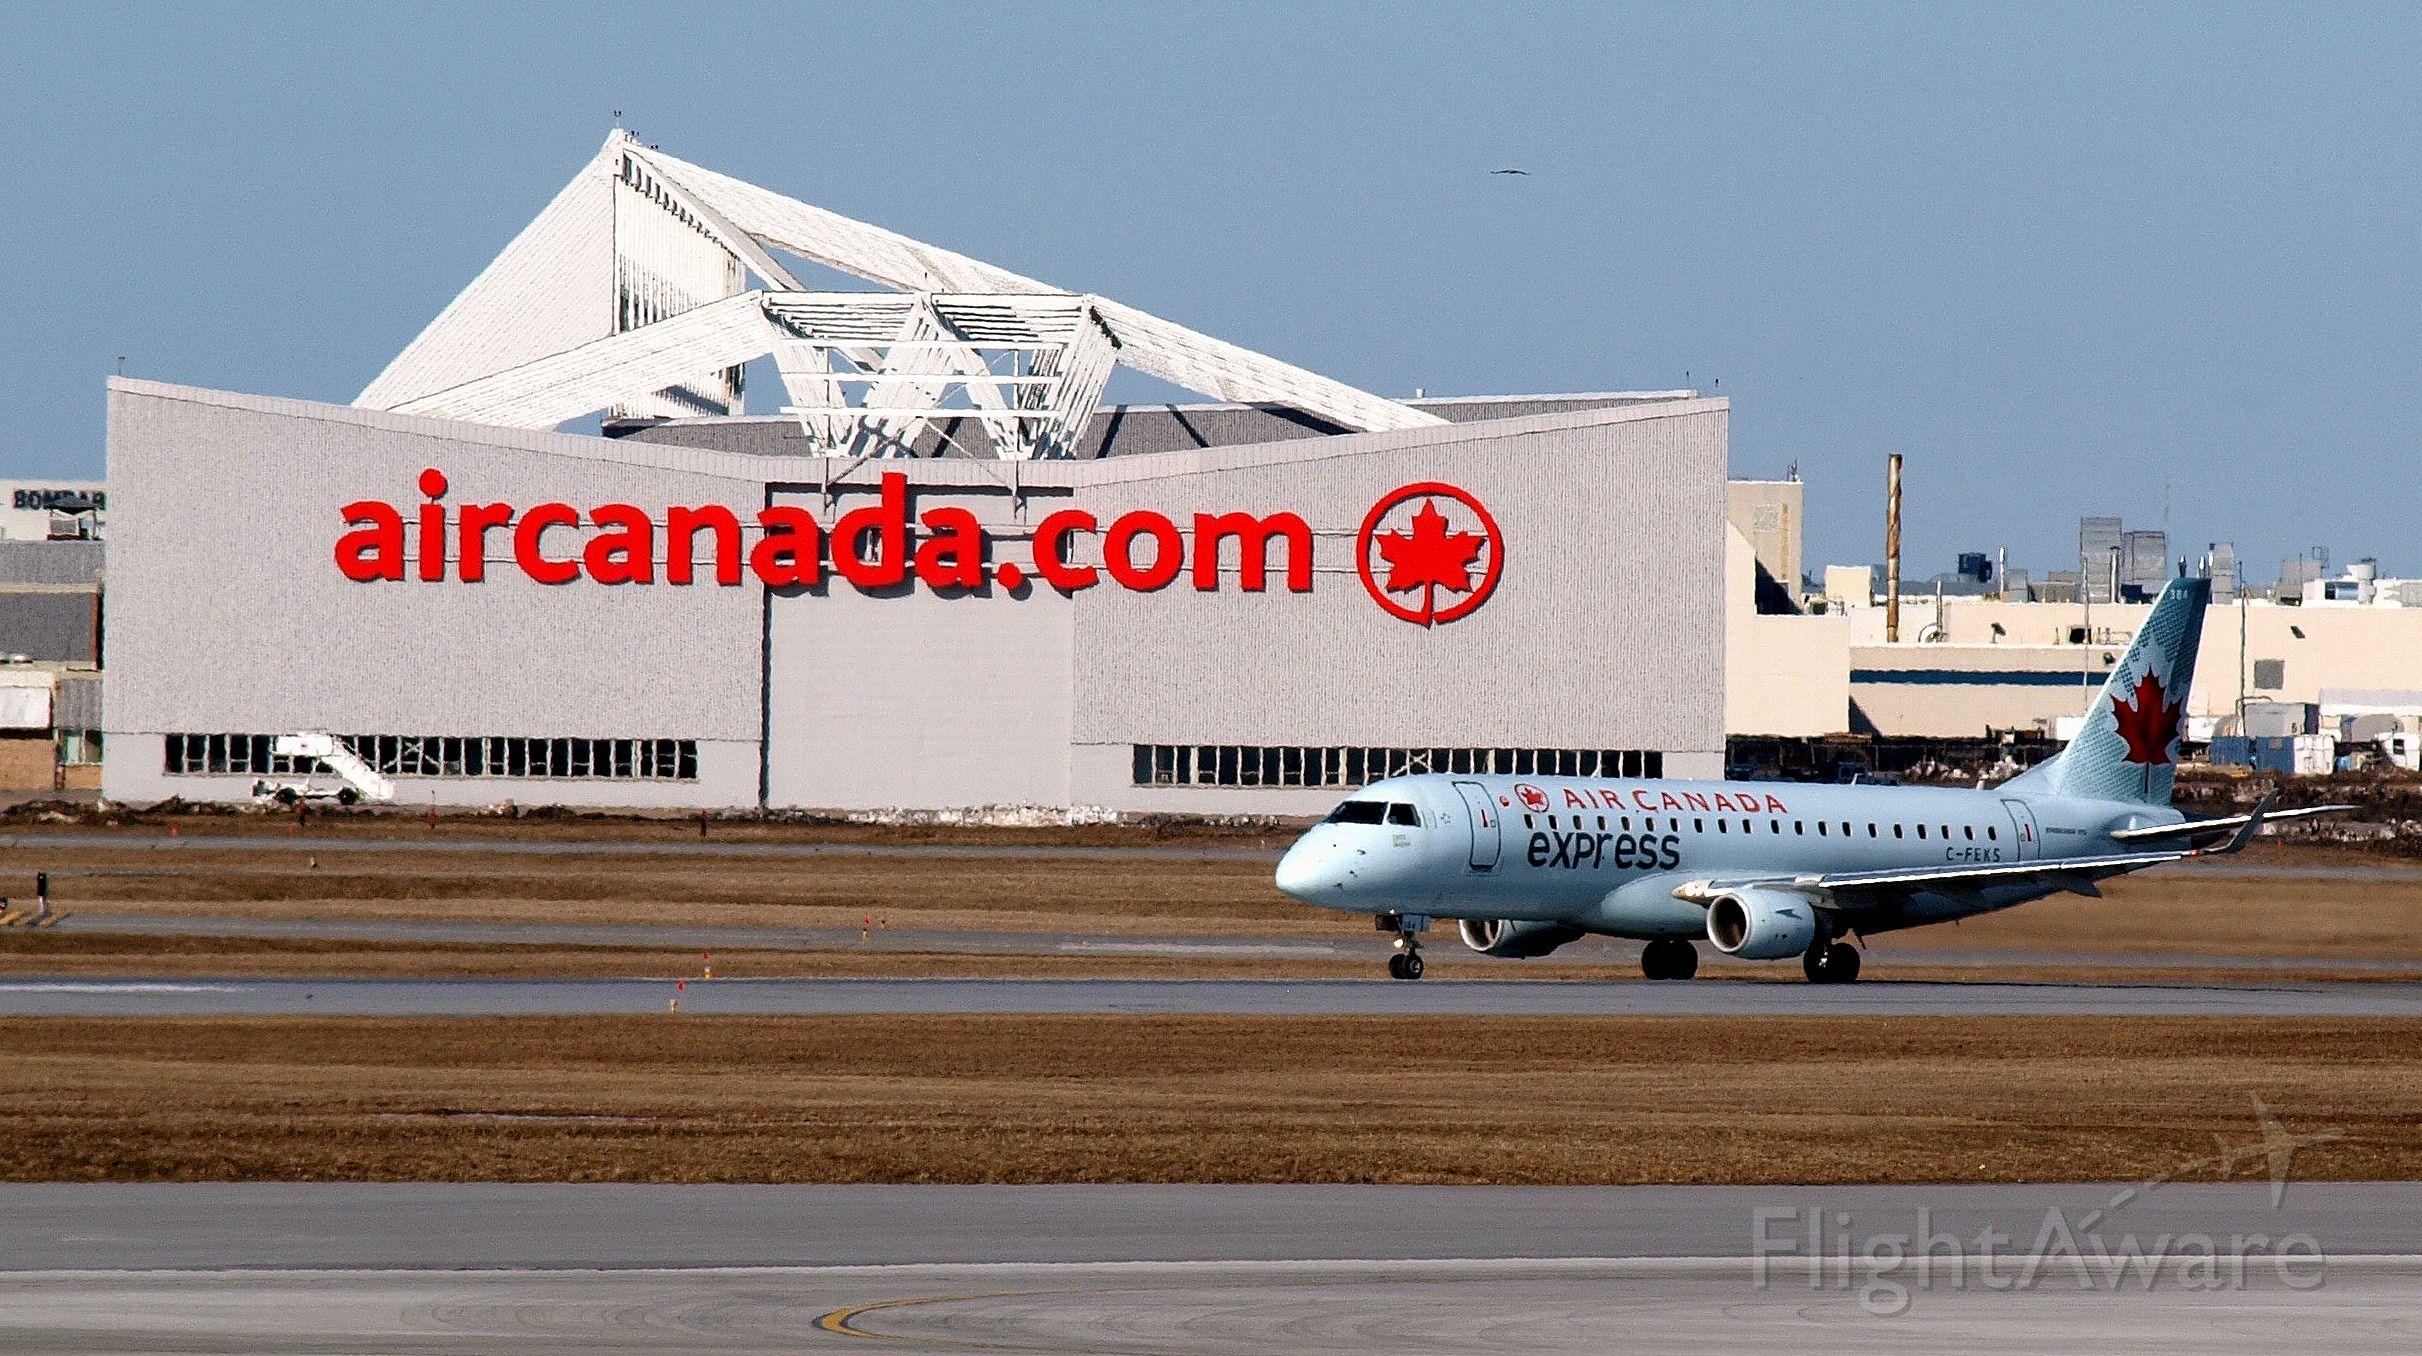 Embraer 170/175 (C-FEKS) - Aéroport Trudeau, 10 avril 2016.